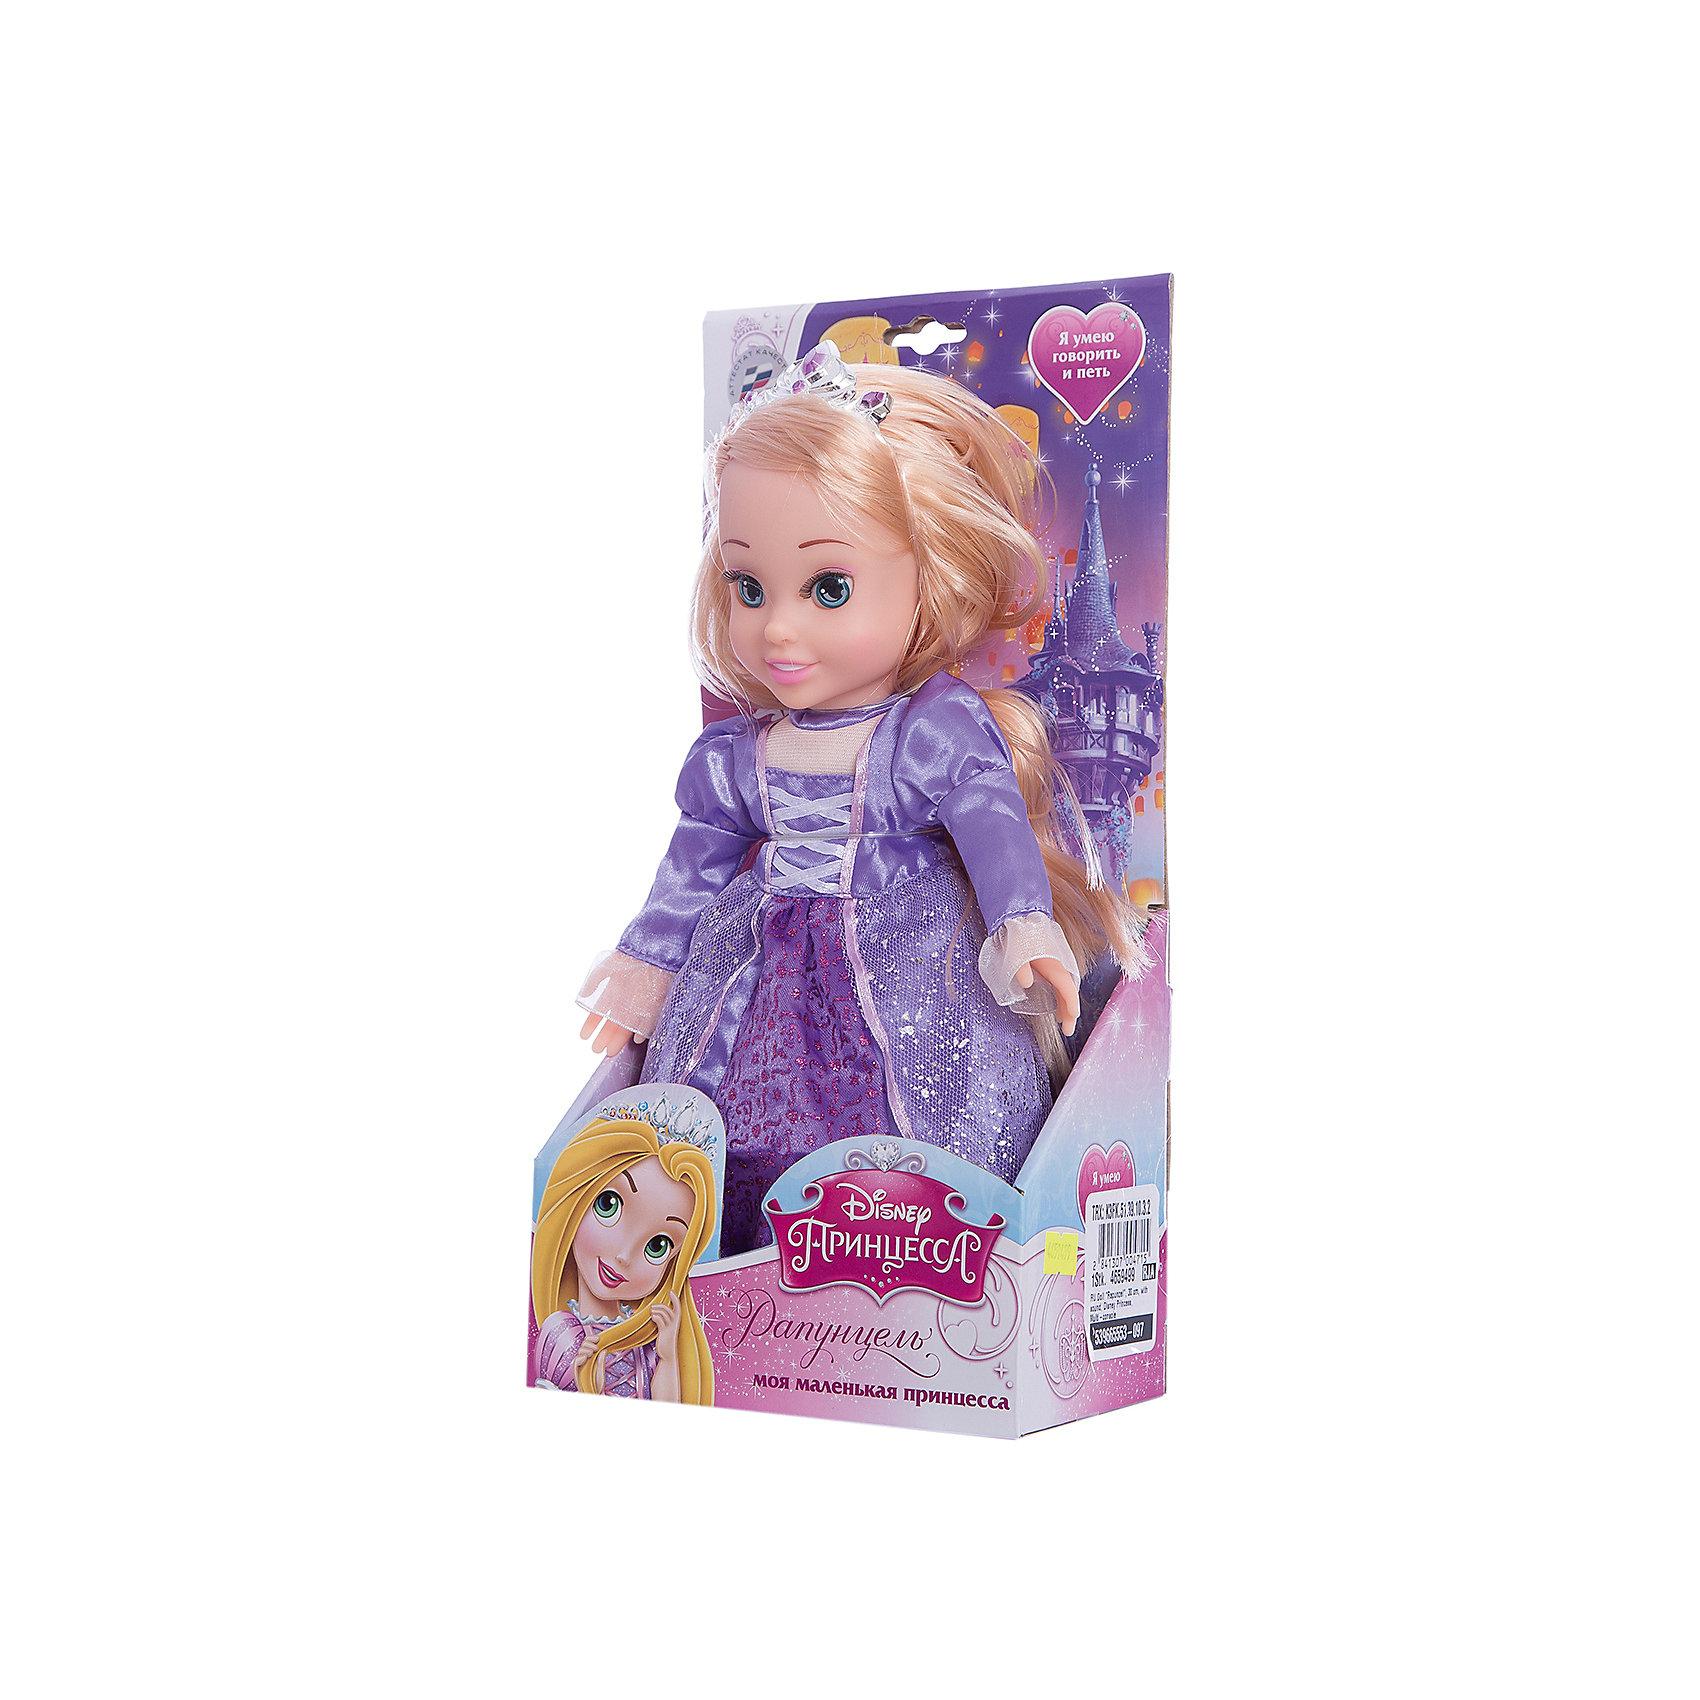 МУЛЬТИ-ПУЛЬТИ Кукла Рапунцель, 30 см, со звуком, Disney Princess, МУЛЬТИ-ПУЛЬТИ мульти пульти коза дереза 23 см со звуком мульти пульти